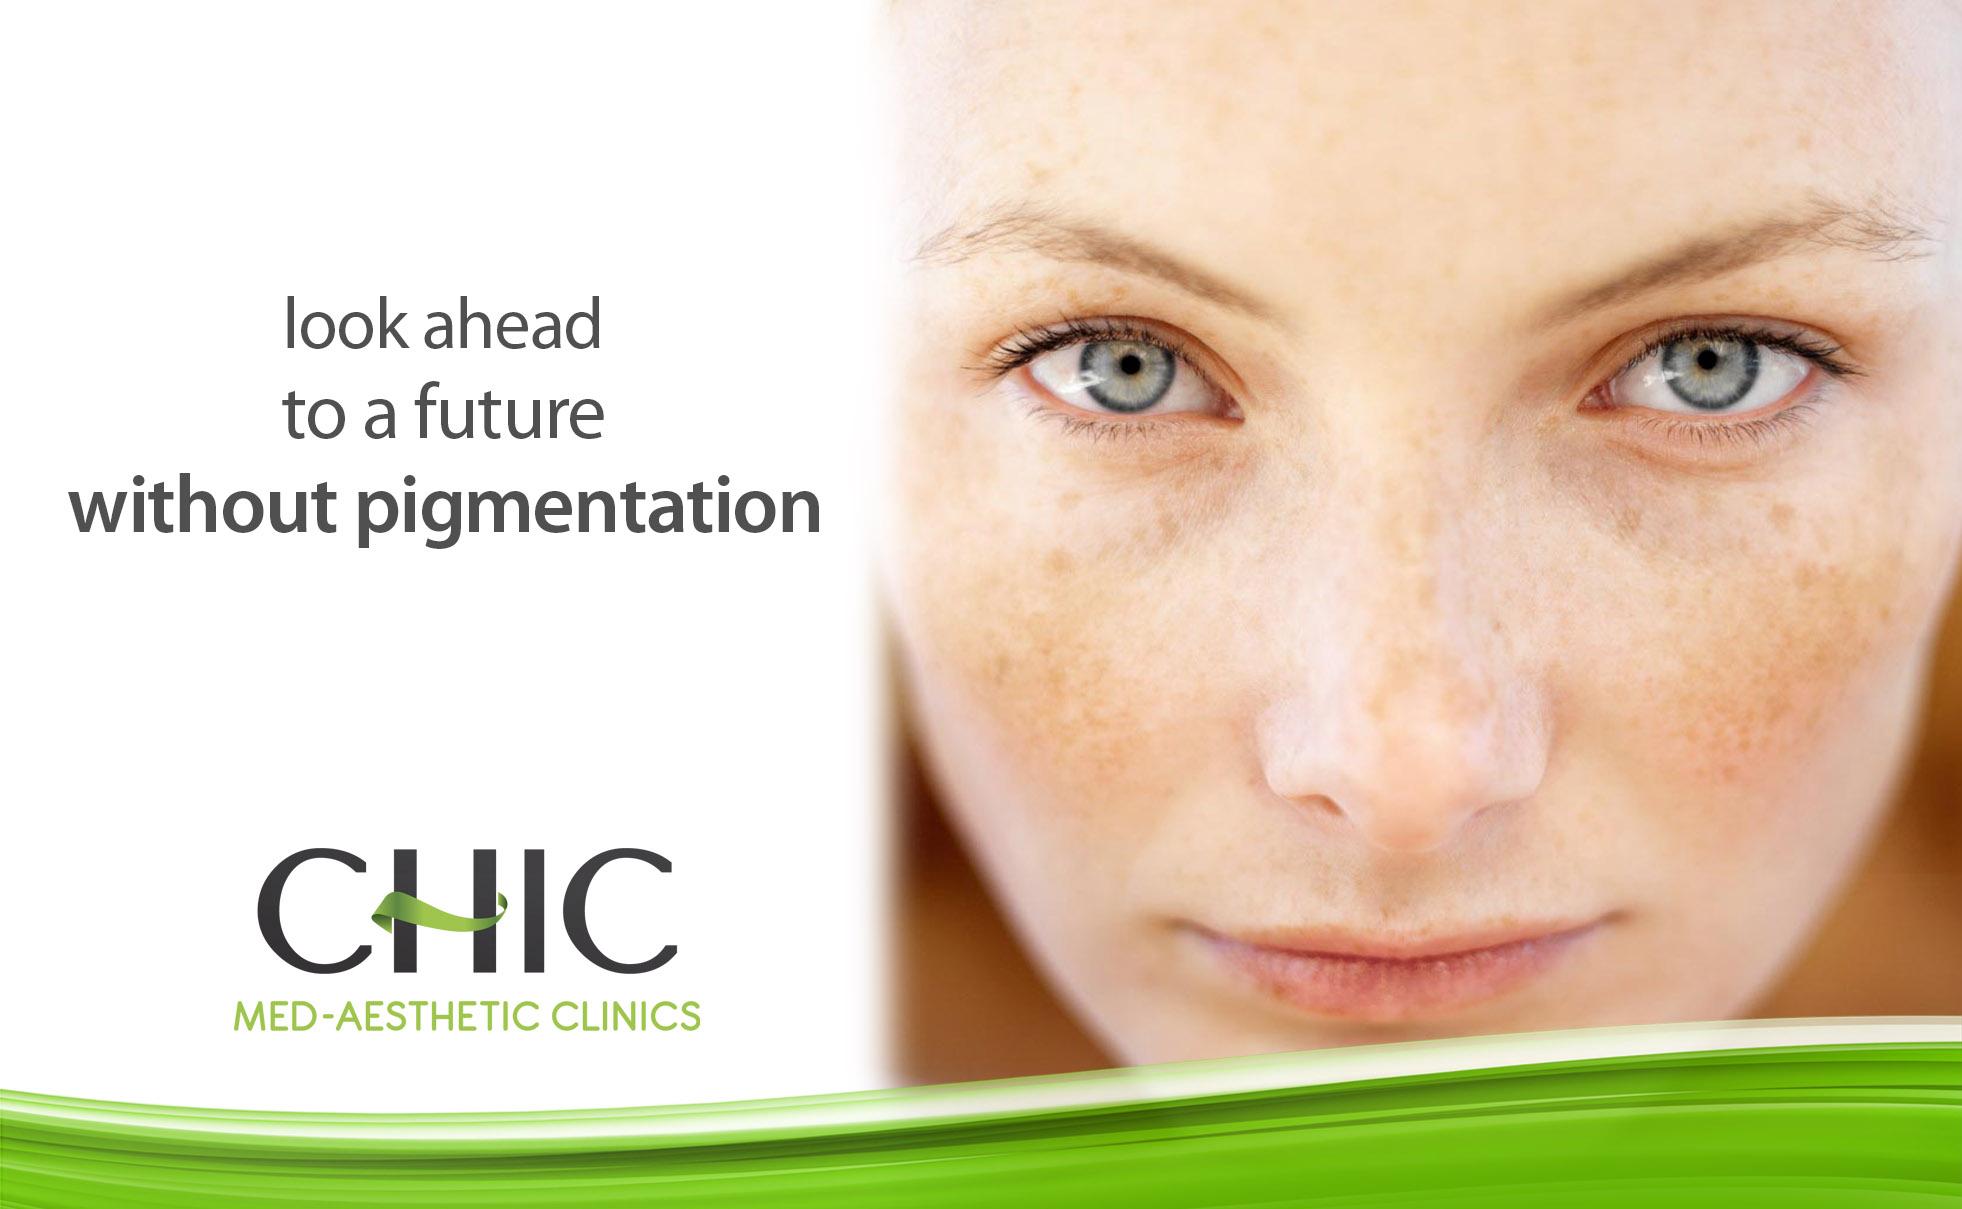 Skin Pigmentation - Chic Med-Aesthetic Clinics